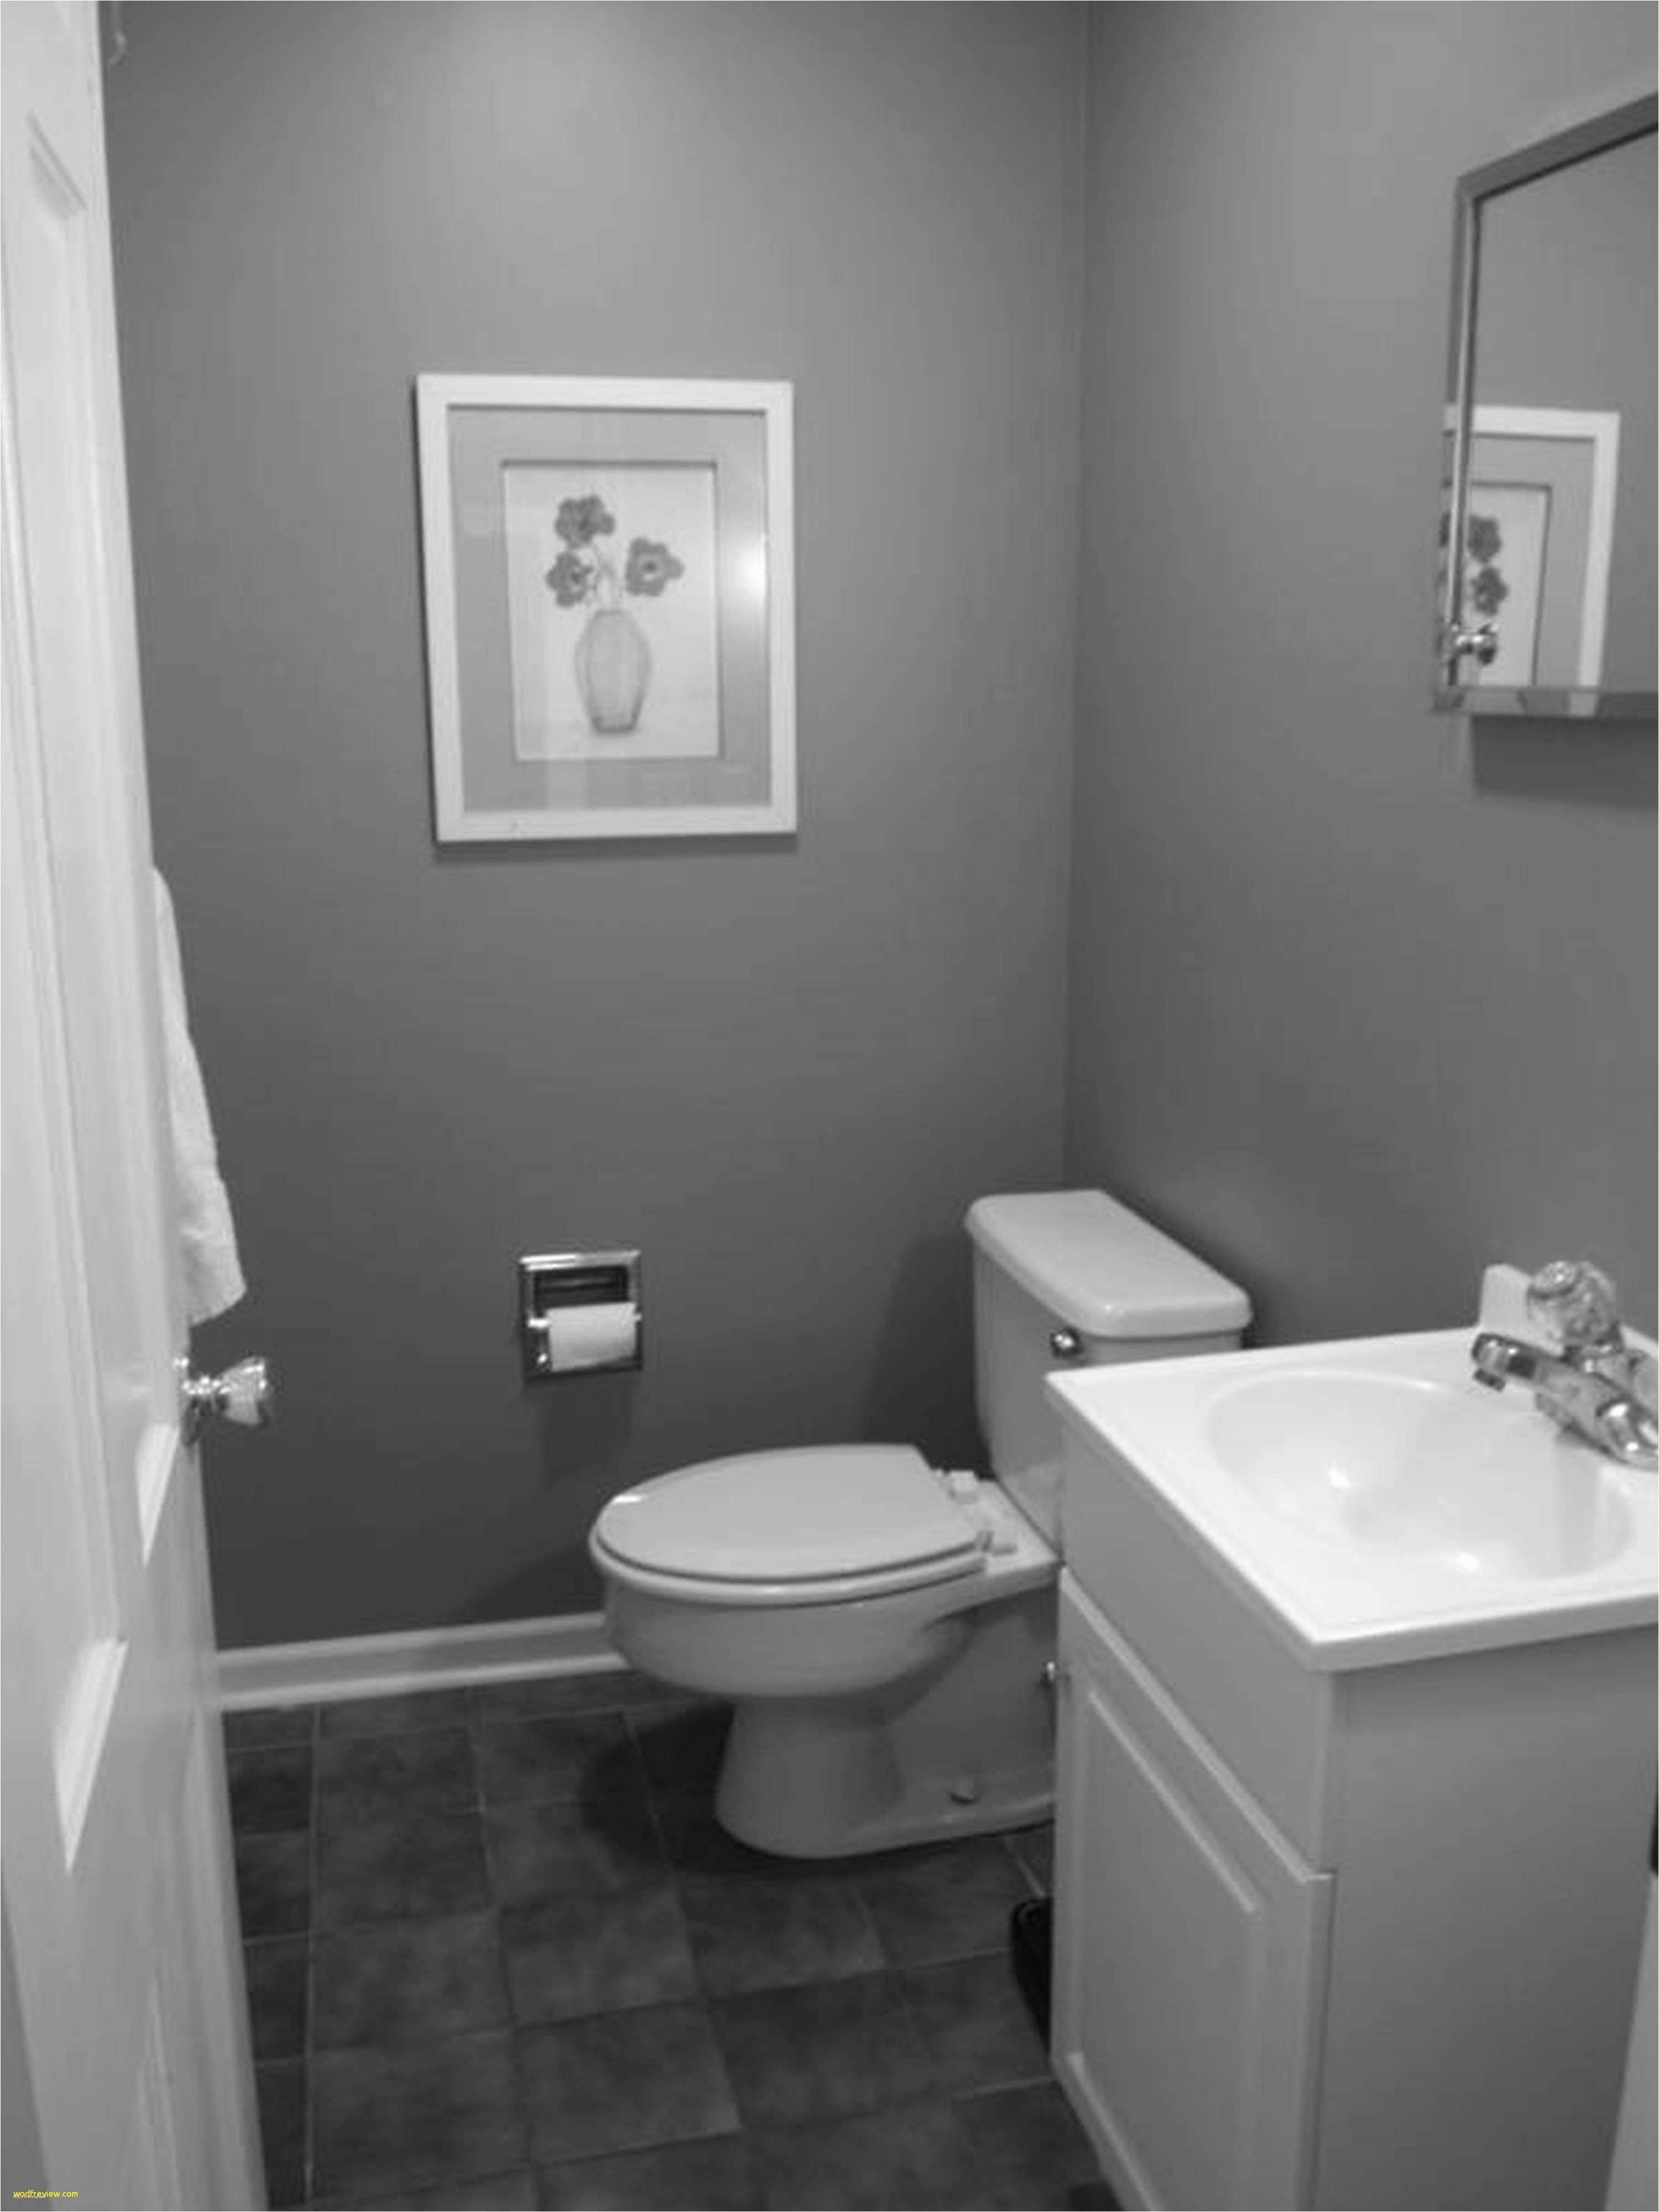 Bathroom Tile Ideas For Small Bathrooms Floor Pin By Jenifer Dun On